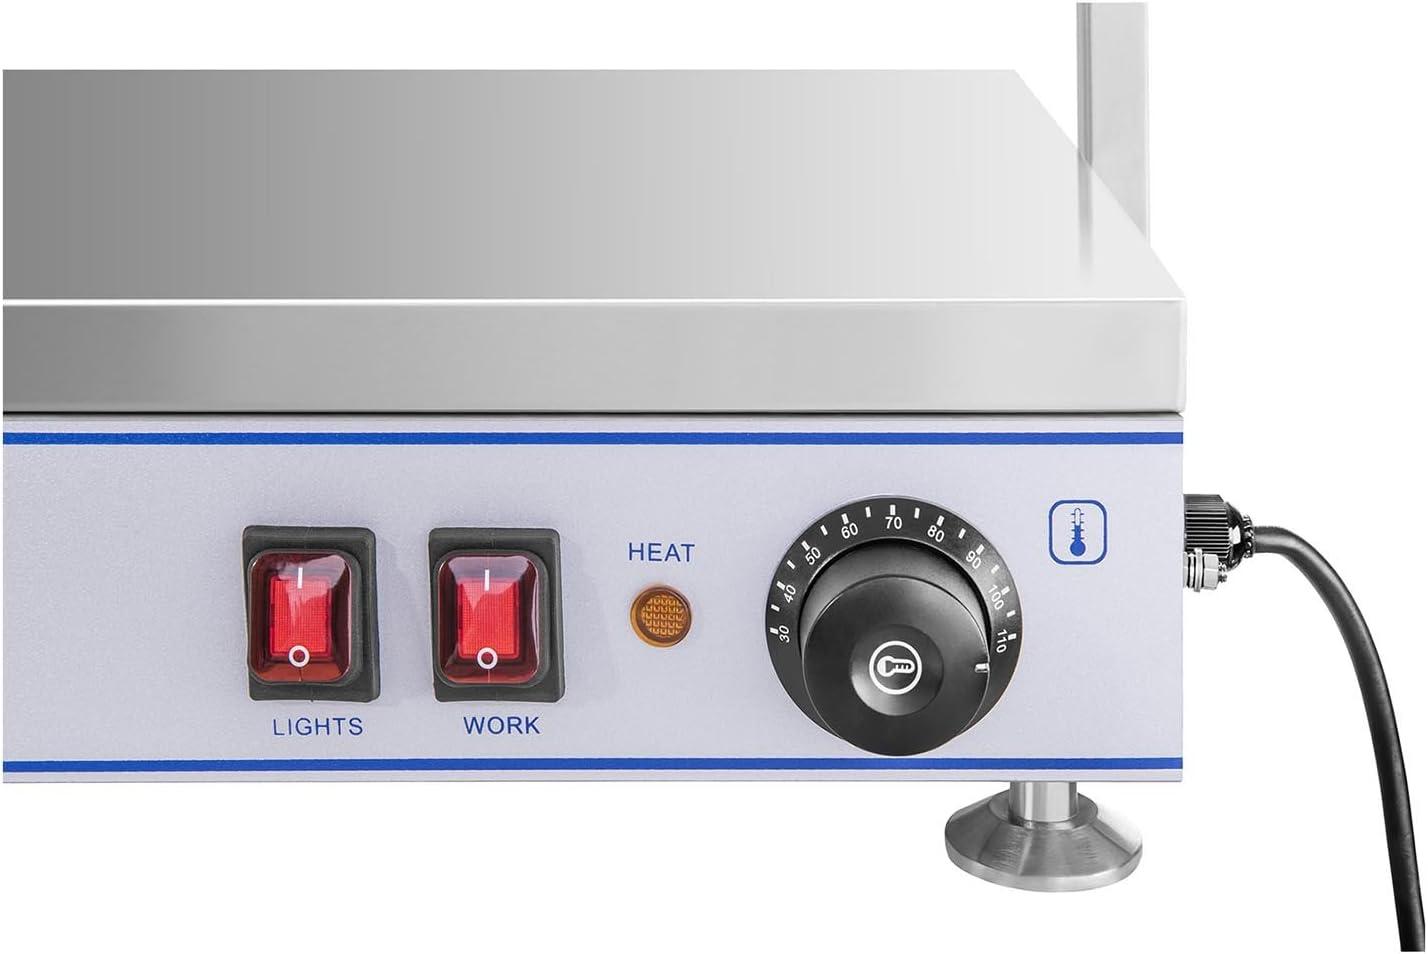 Warmhalteplatte Speisenwärmer Wärmetheke Buffetwärmer 2000 W 4 Halogenlampen